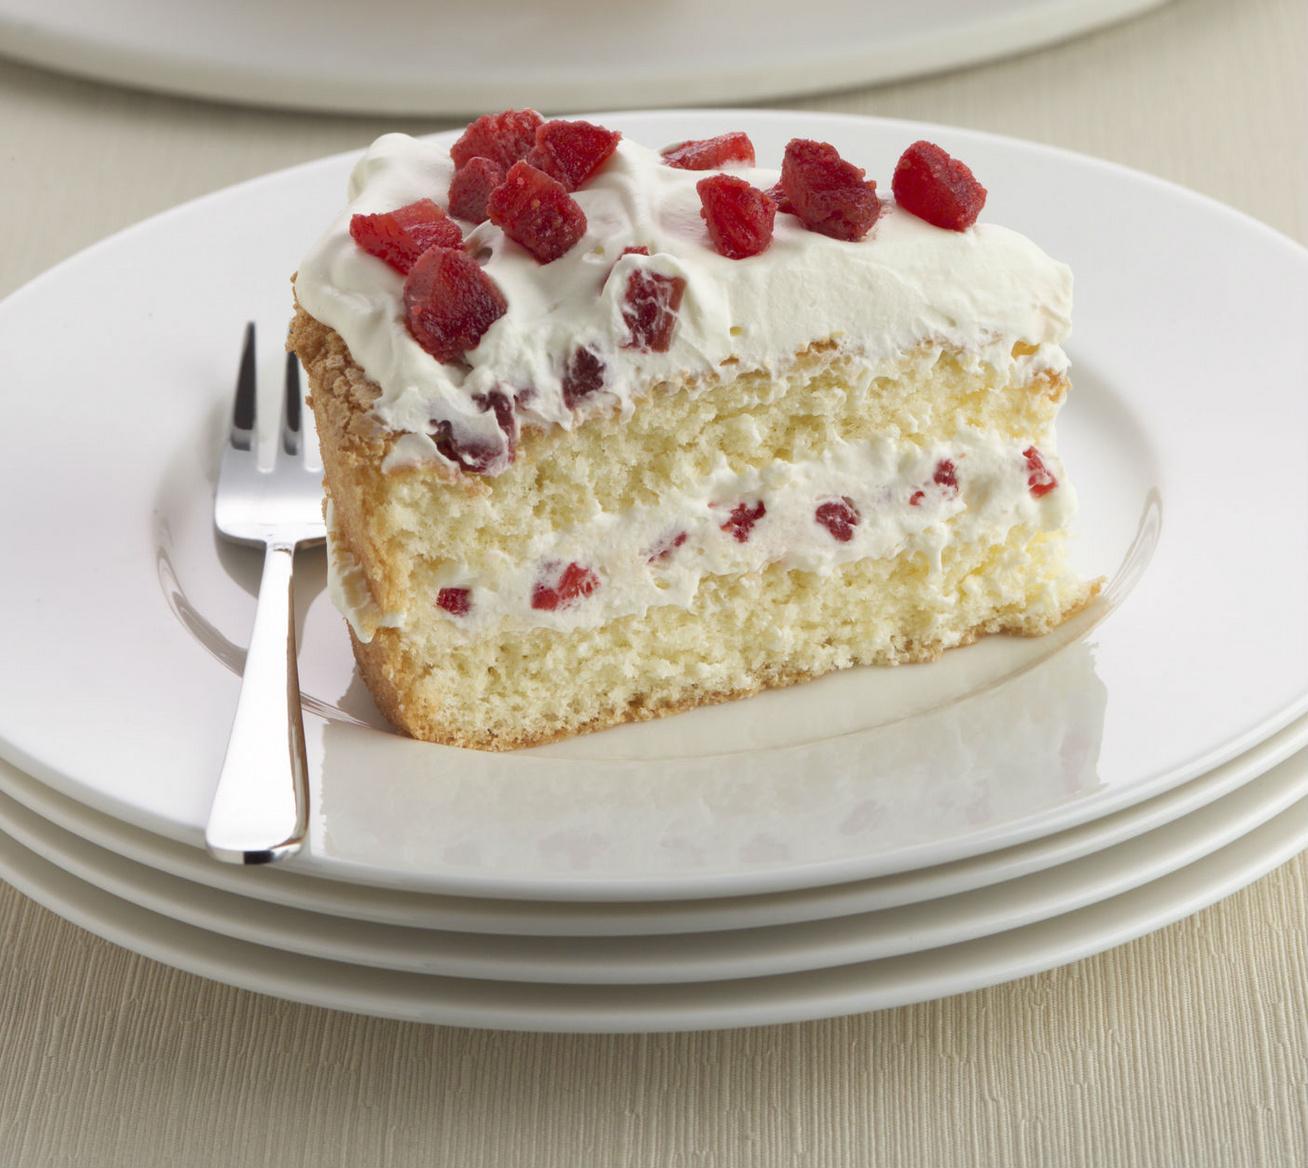 tejszines-malnas-torta